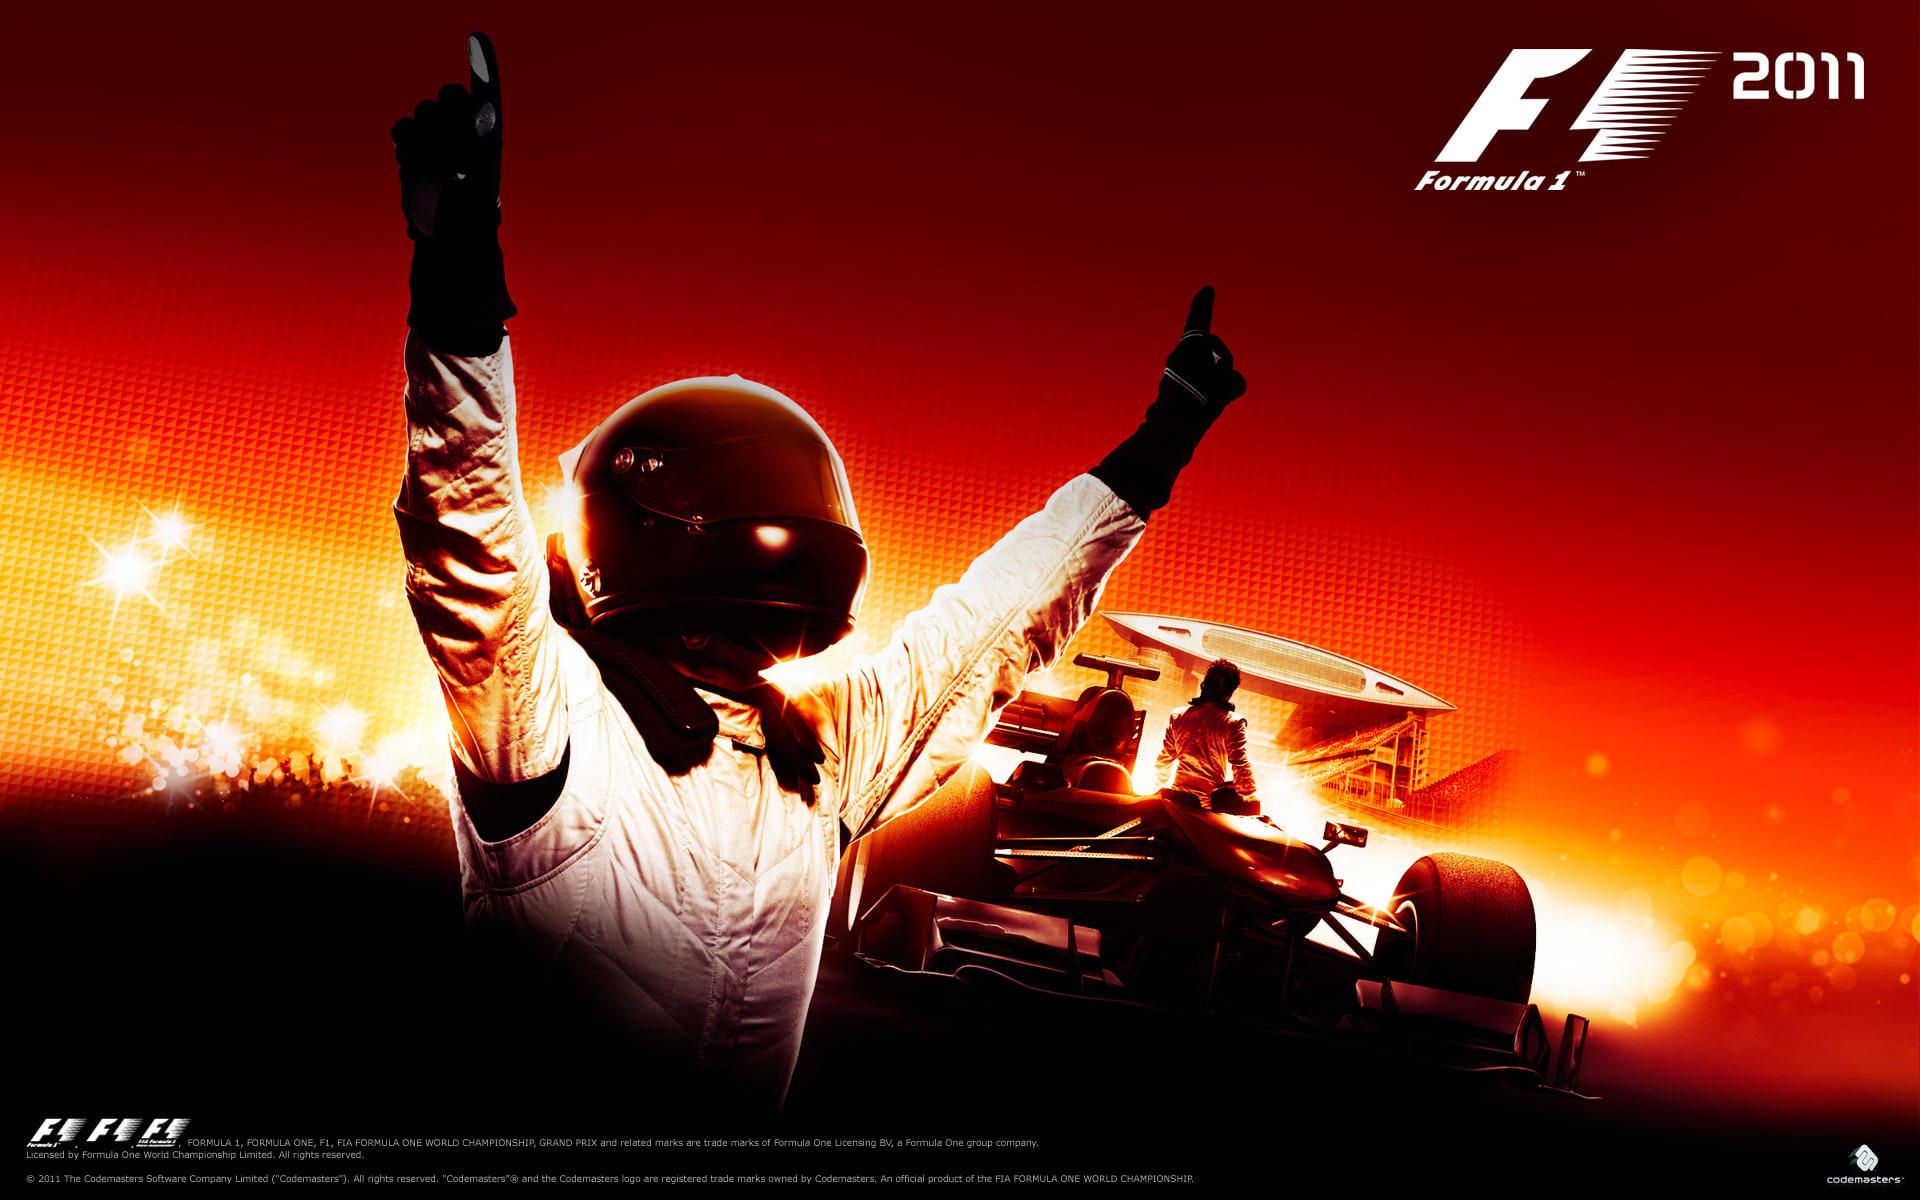 F1 2011 Wallpaper